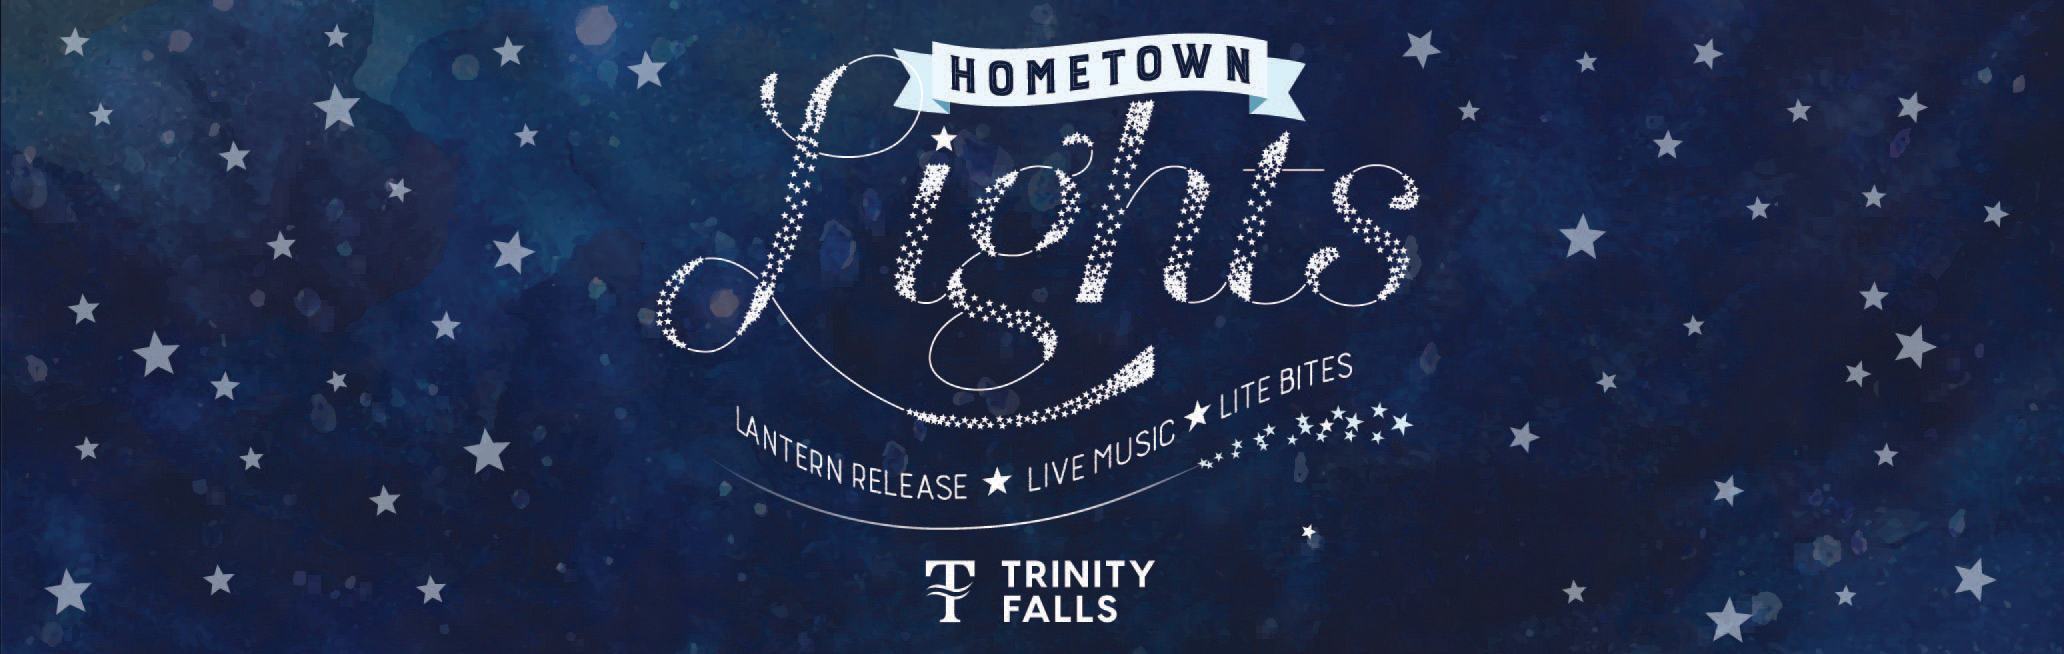 Hometown Lights